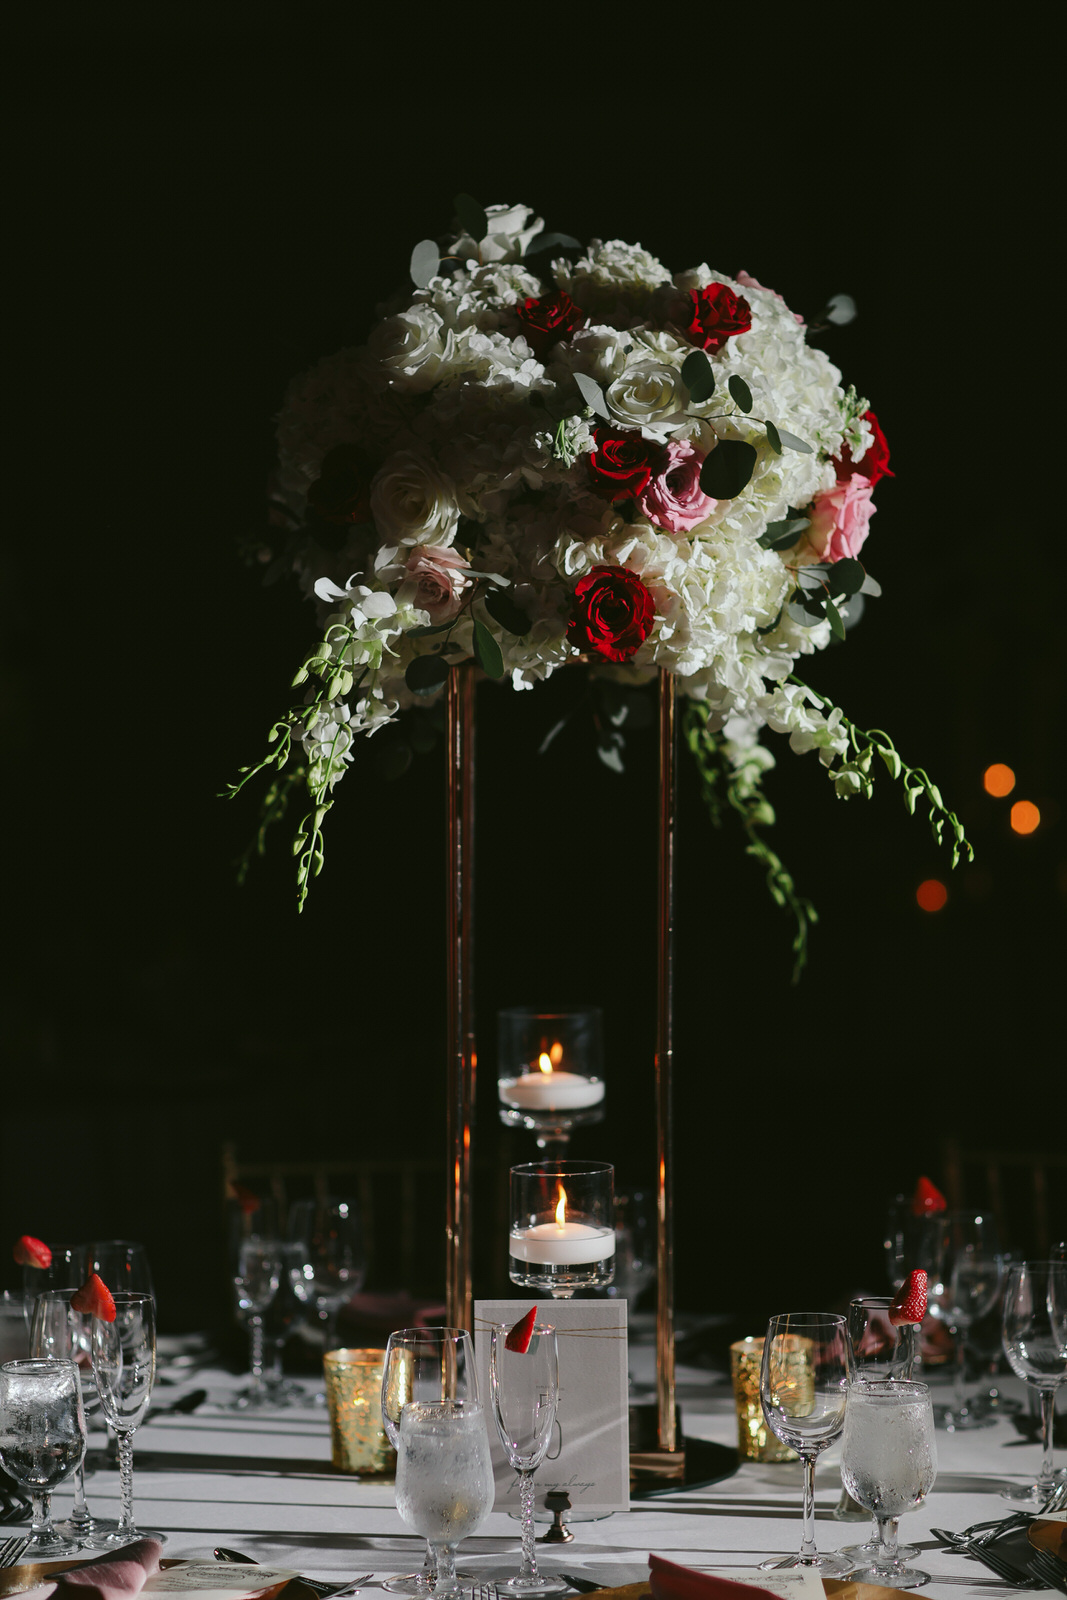 Benvenuto_Wedding_Reception_Details_Tiny_House_Photo_Florida_LGBTQ_Weddings.jpg